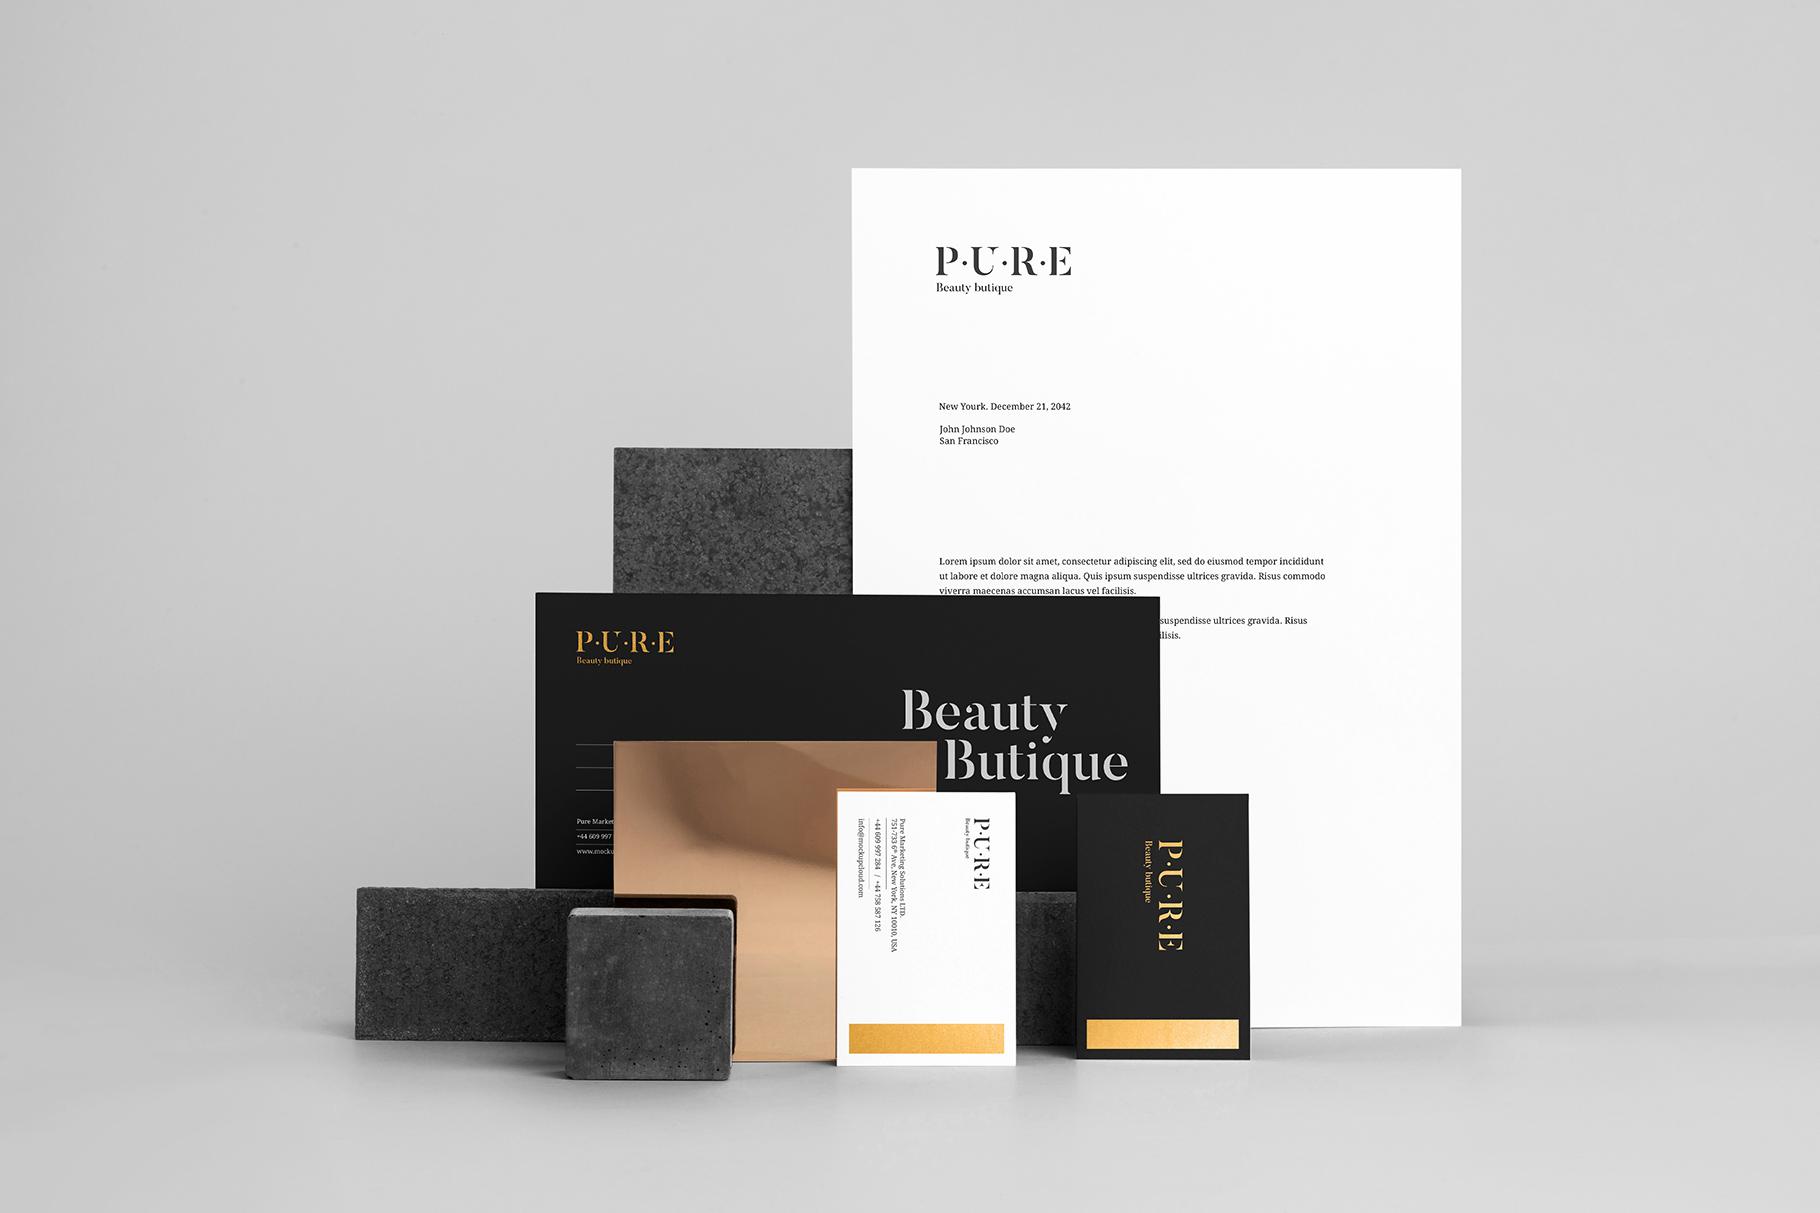 08 pure branding mockup vol2